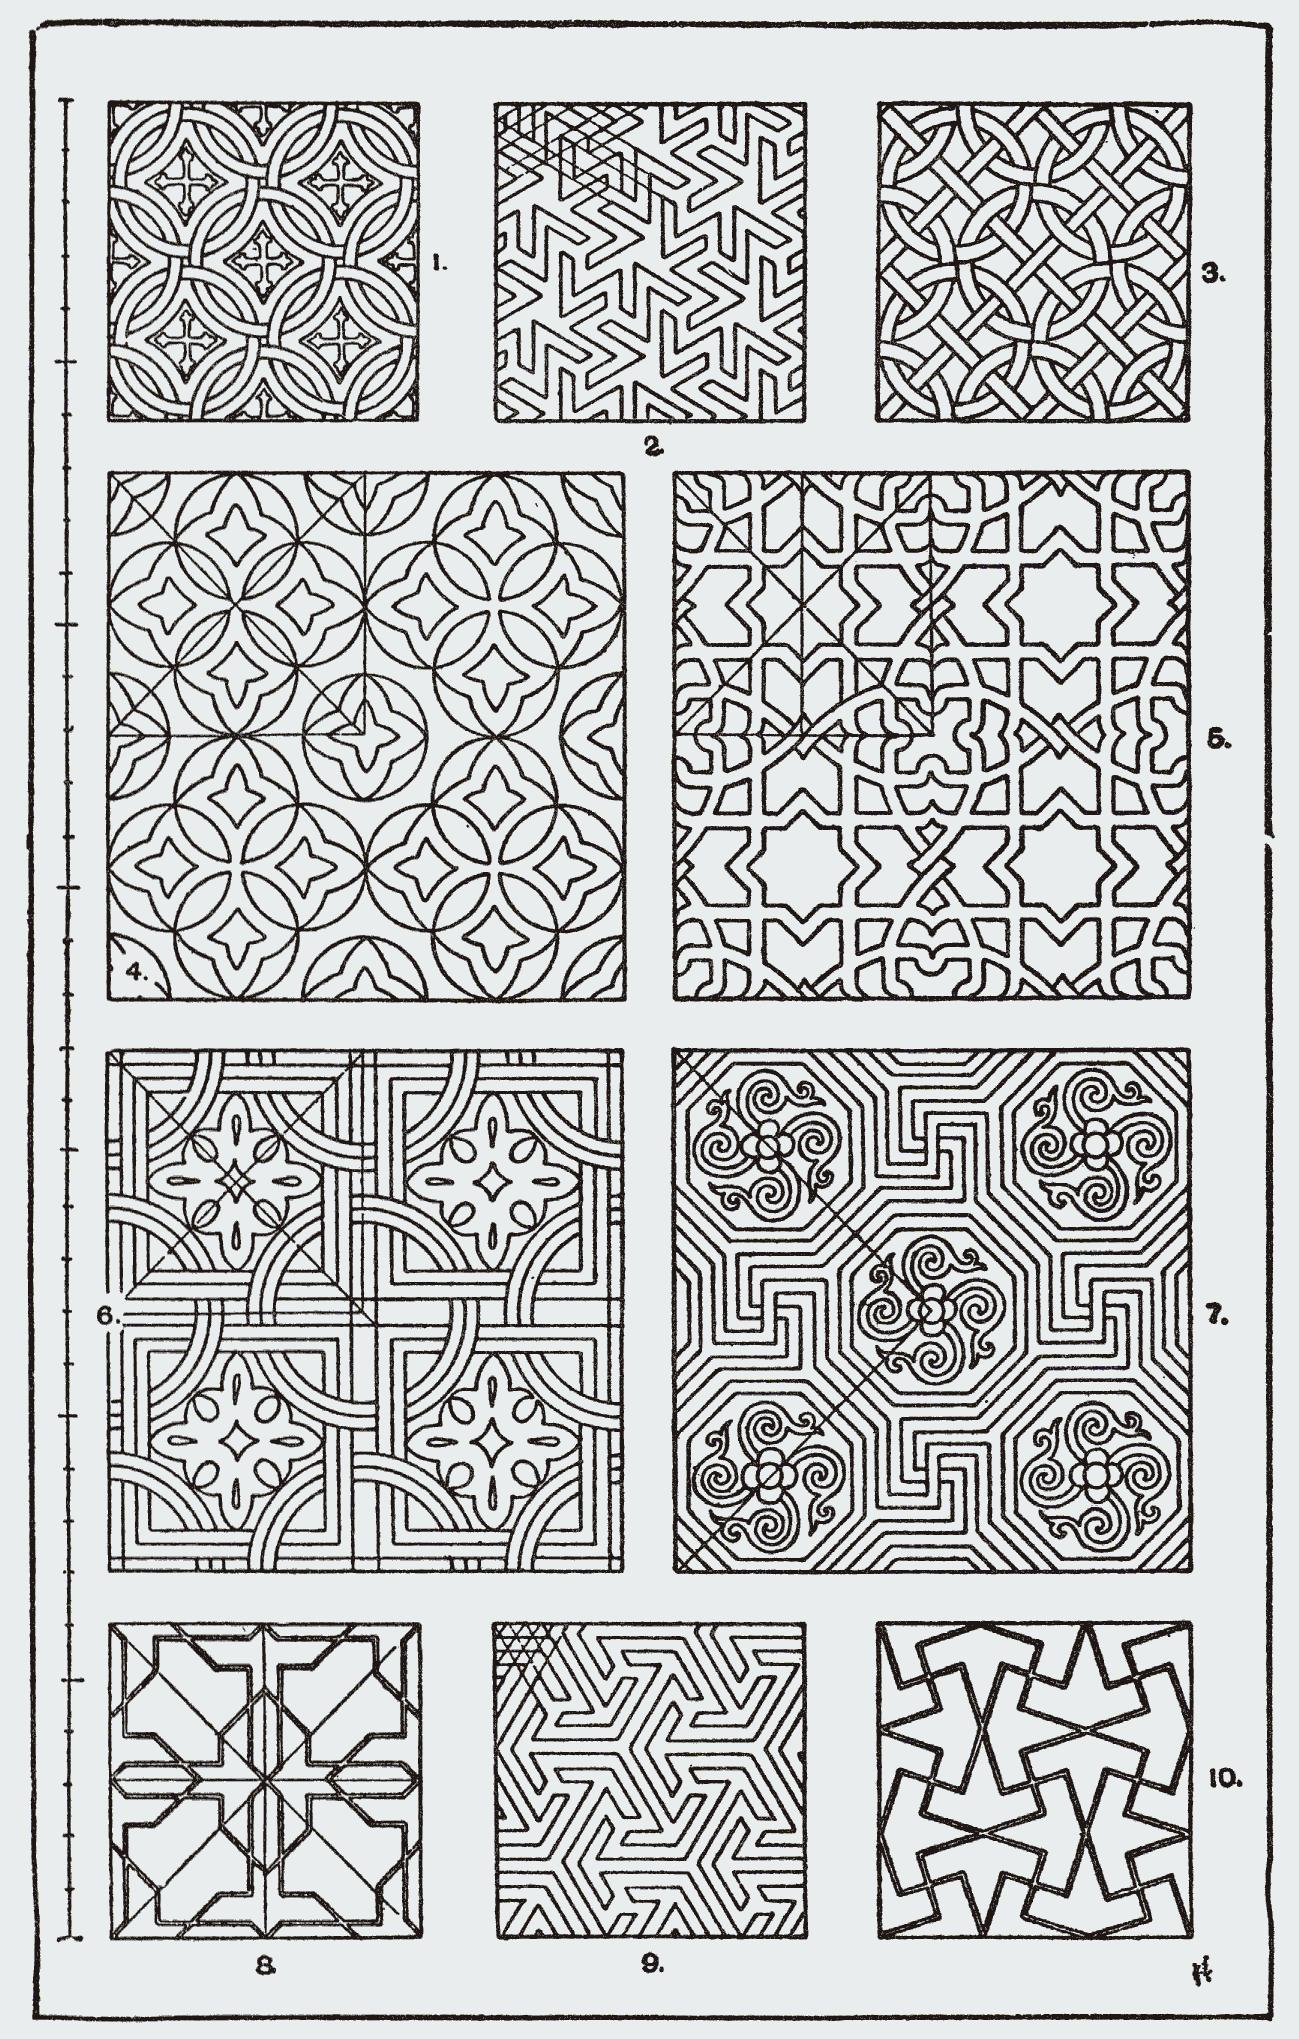 fileorna172 mosaikmusterpng - Mosaik Muster